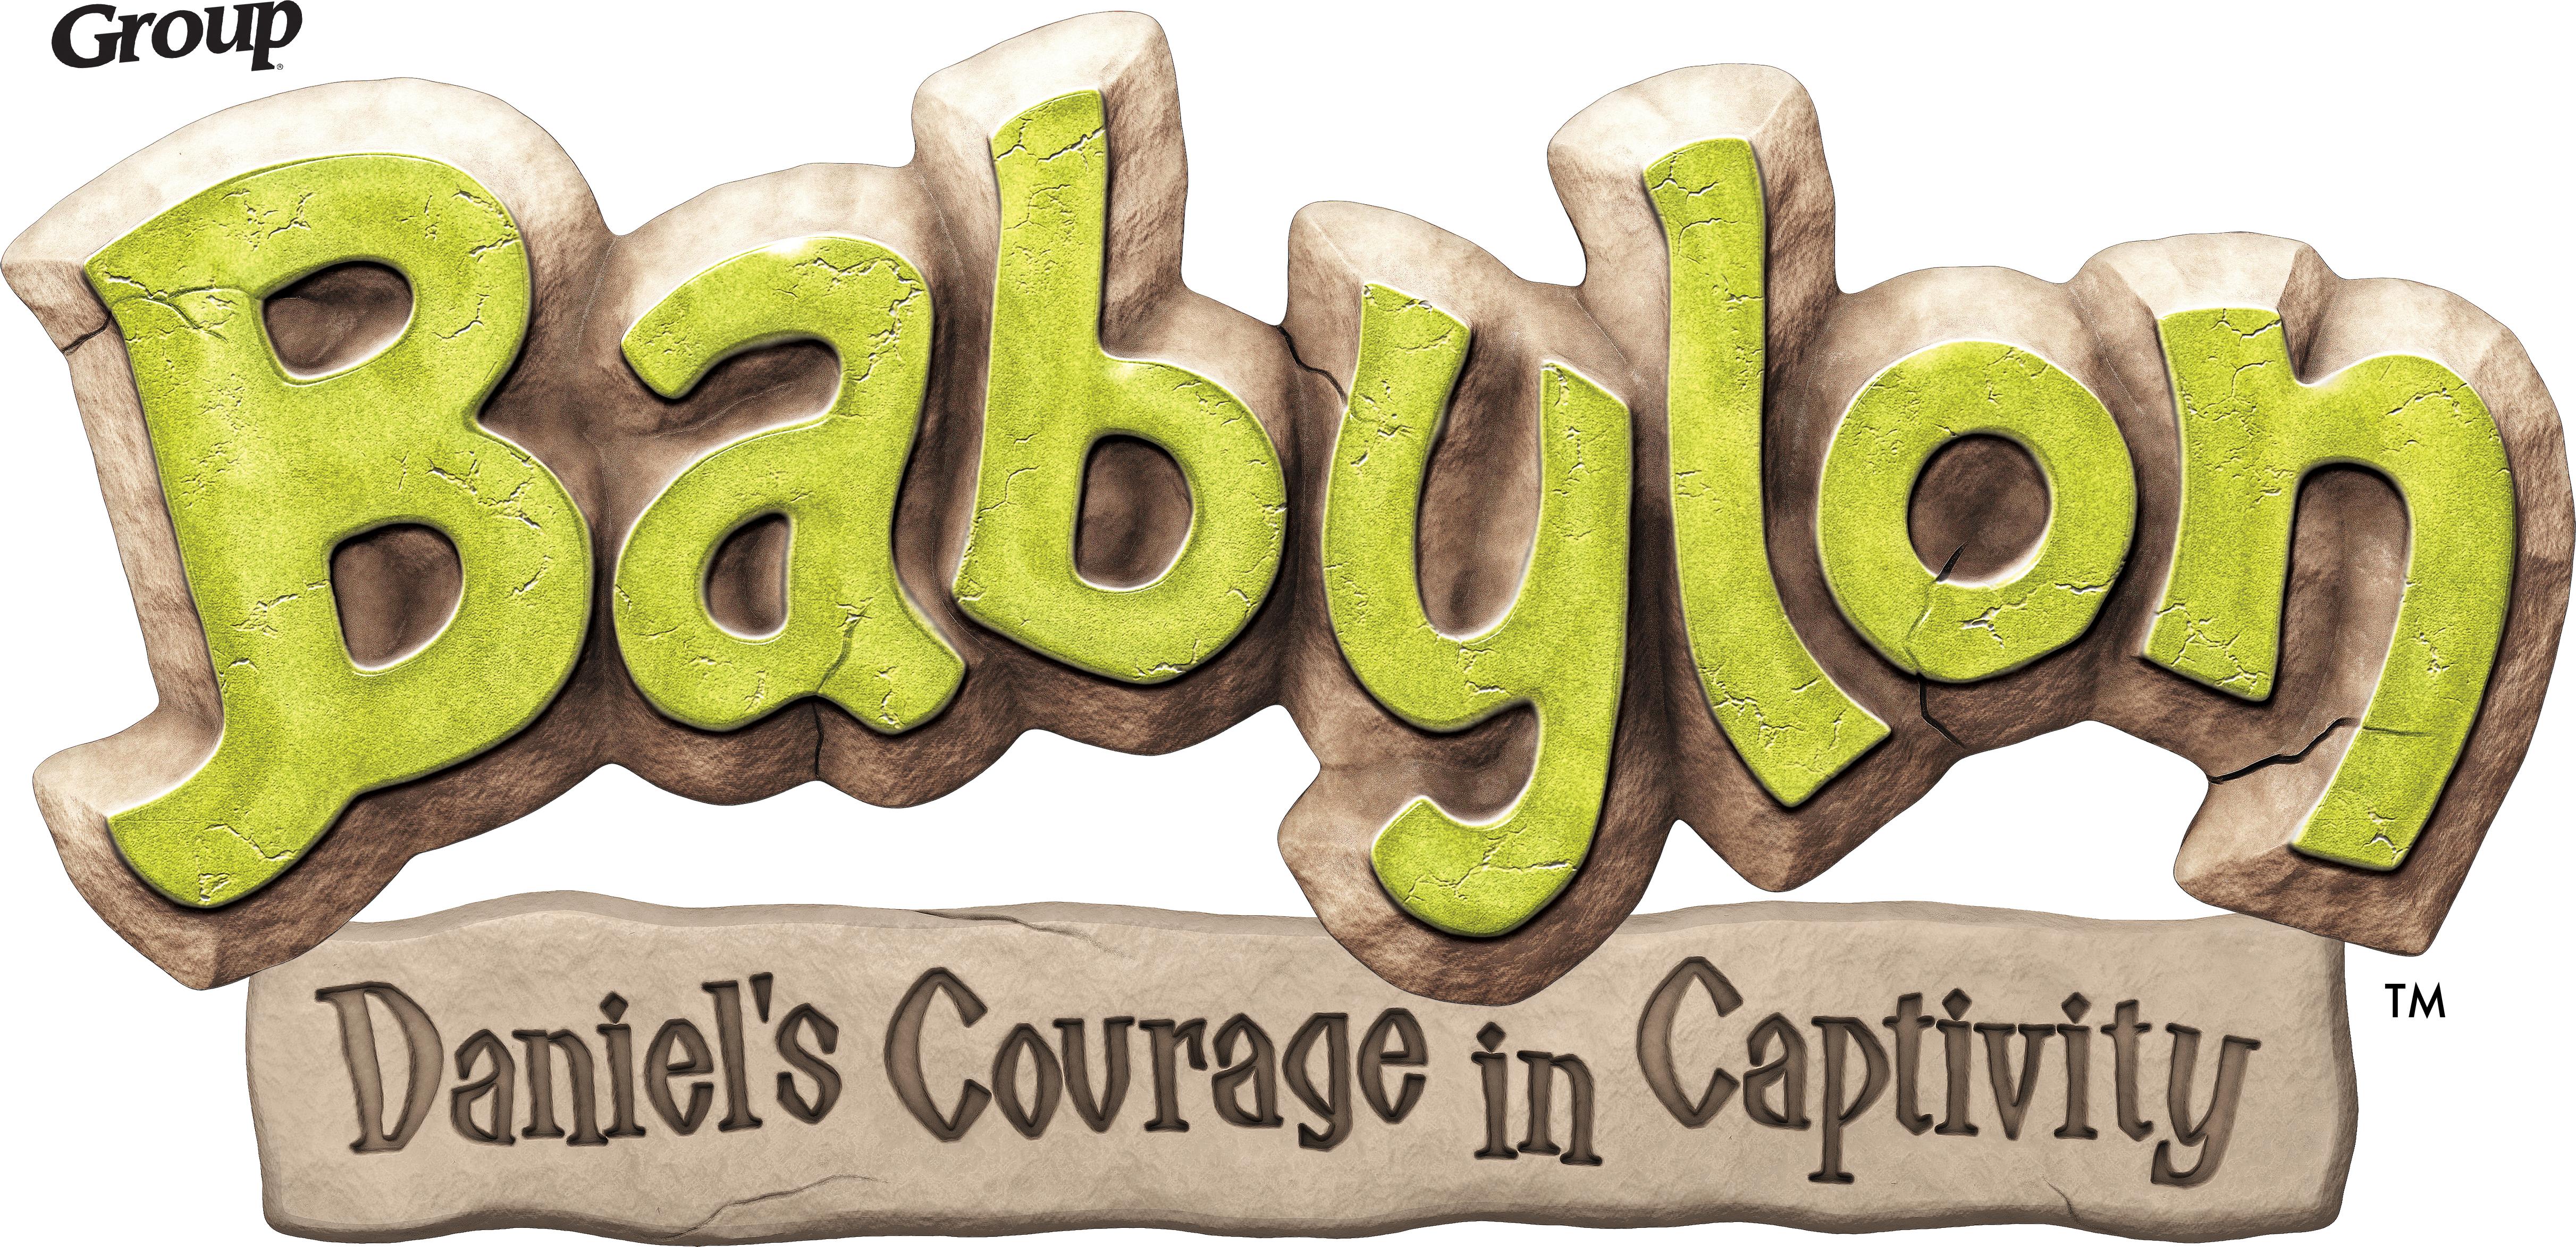 Babylon vbs logo hires rgb